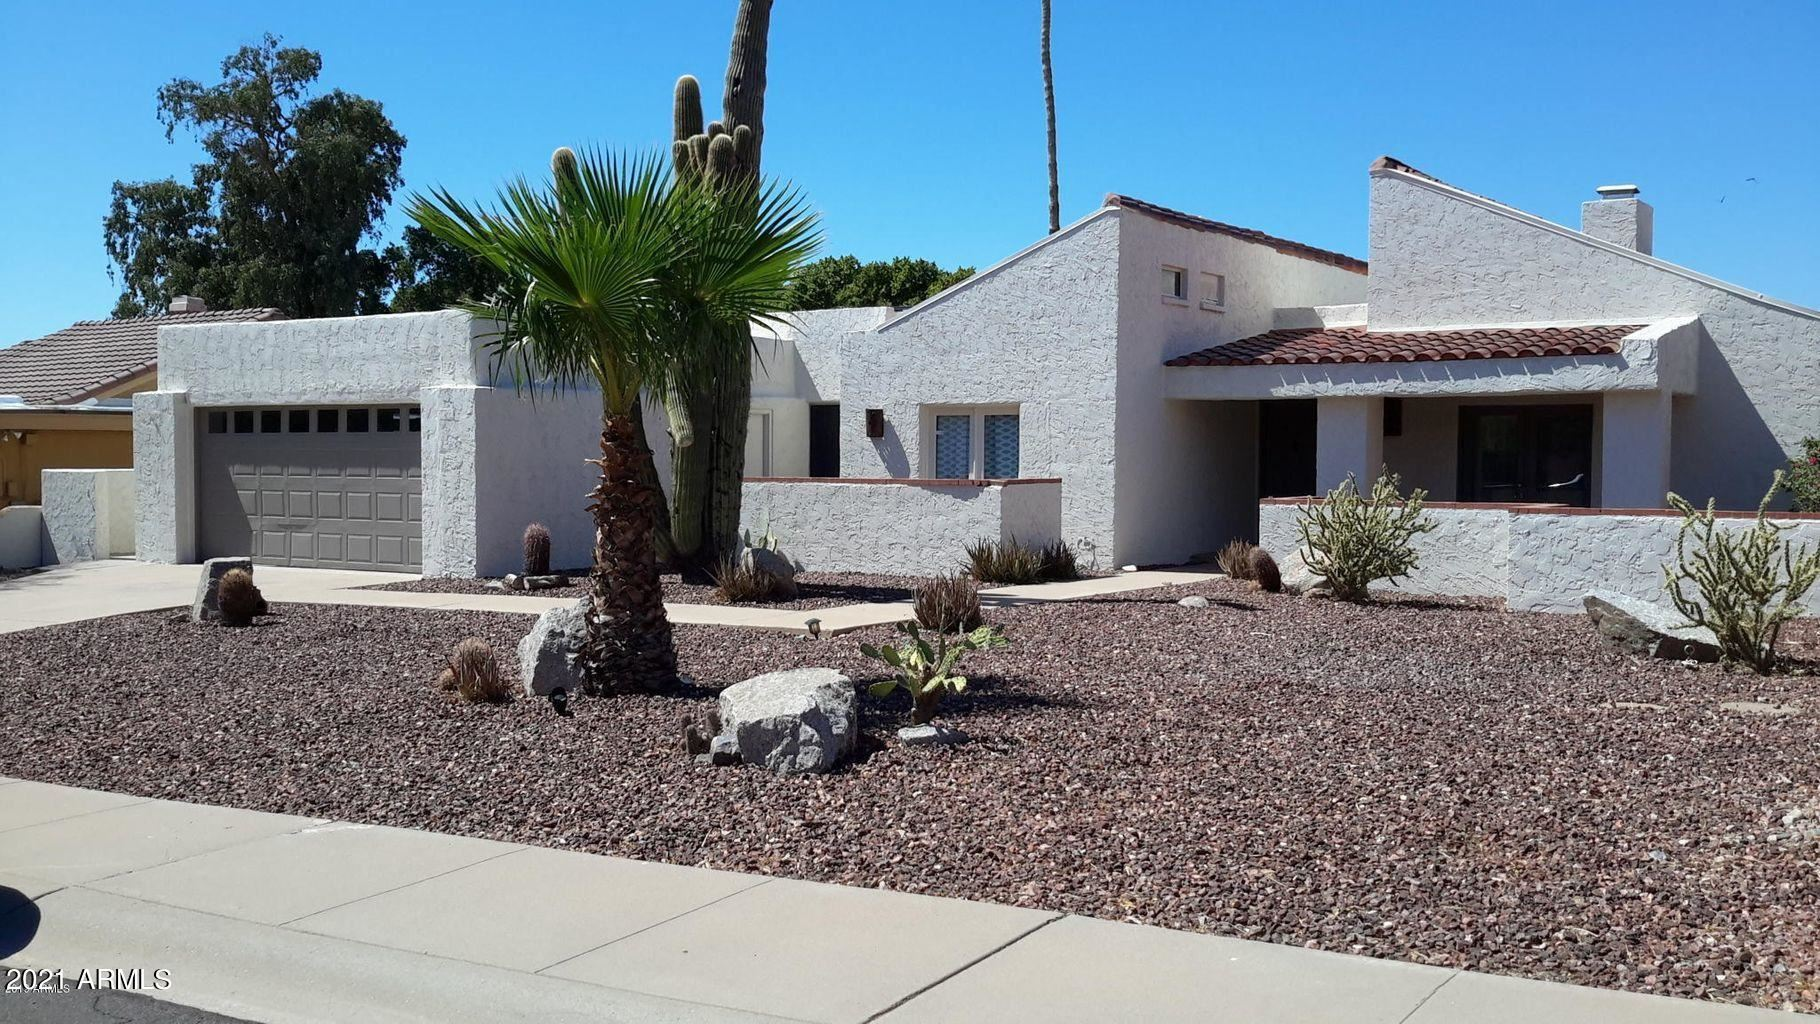 8422 N 16TH Place, Phoenix, AZ 85020 - MLS#: 6230955